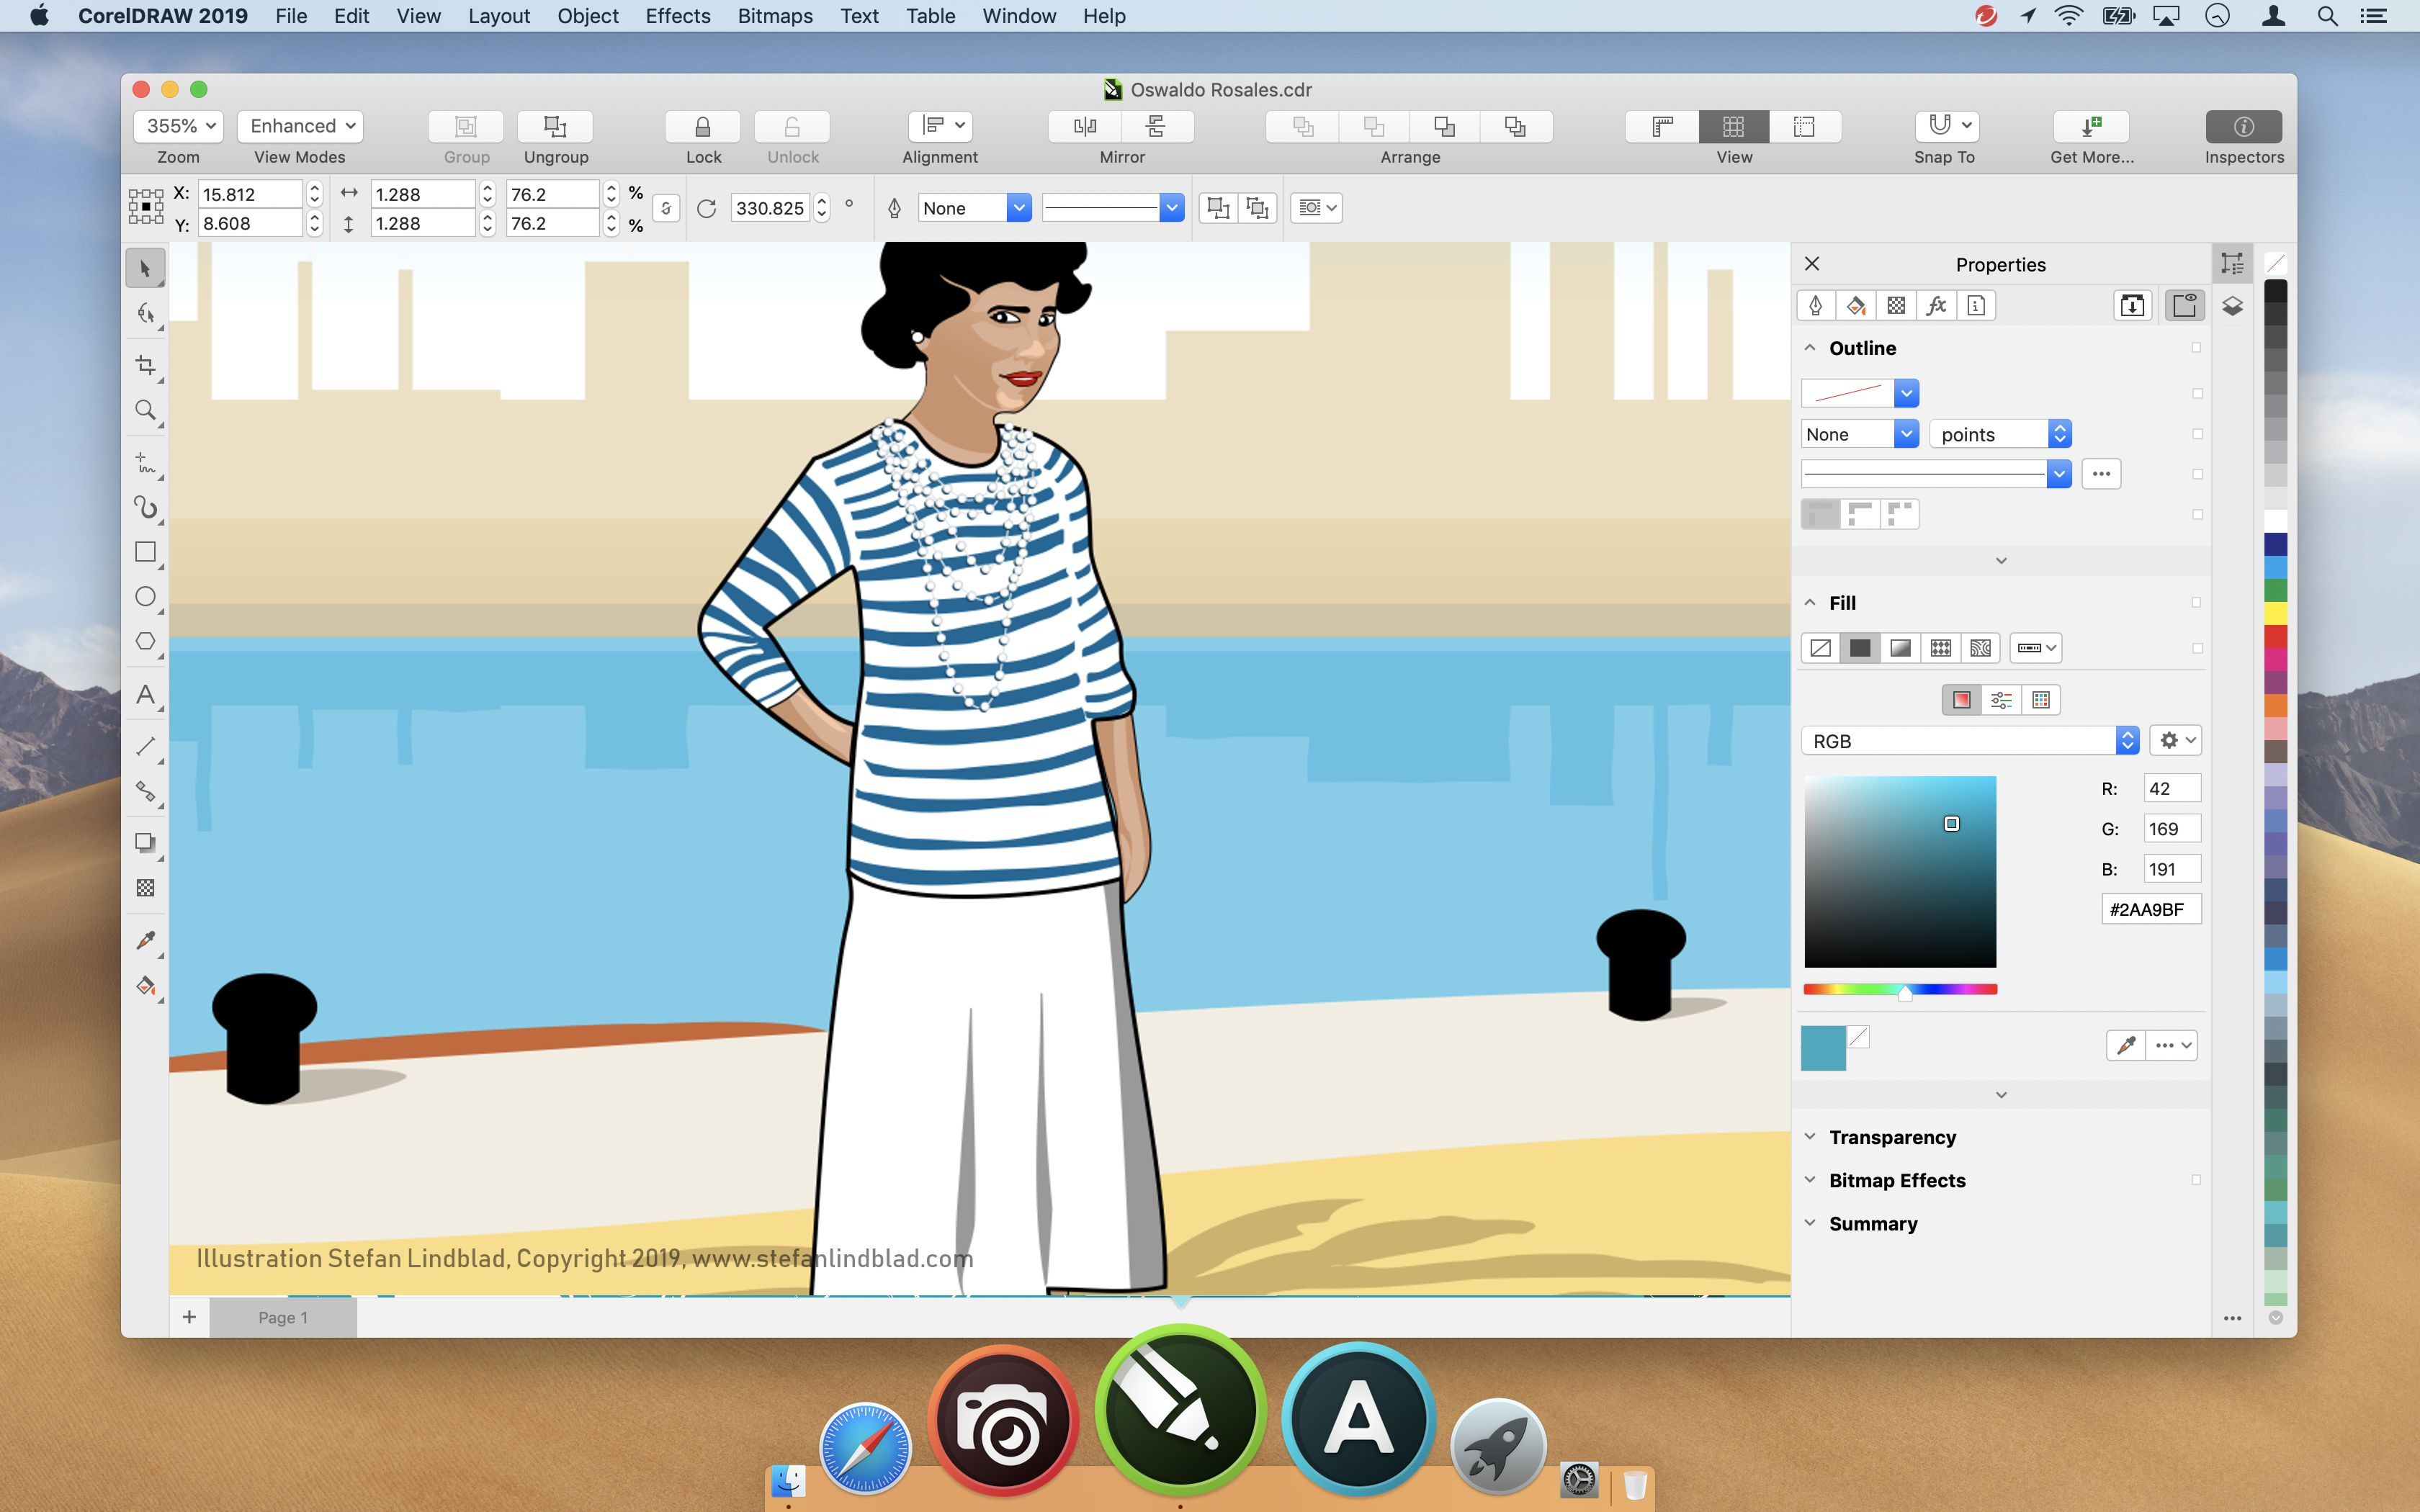 CorelDRAW 2019 for Mac, Vector illustration, editorial, by Stefan Lindblad